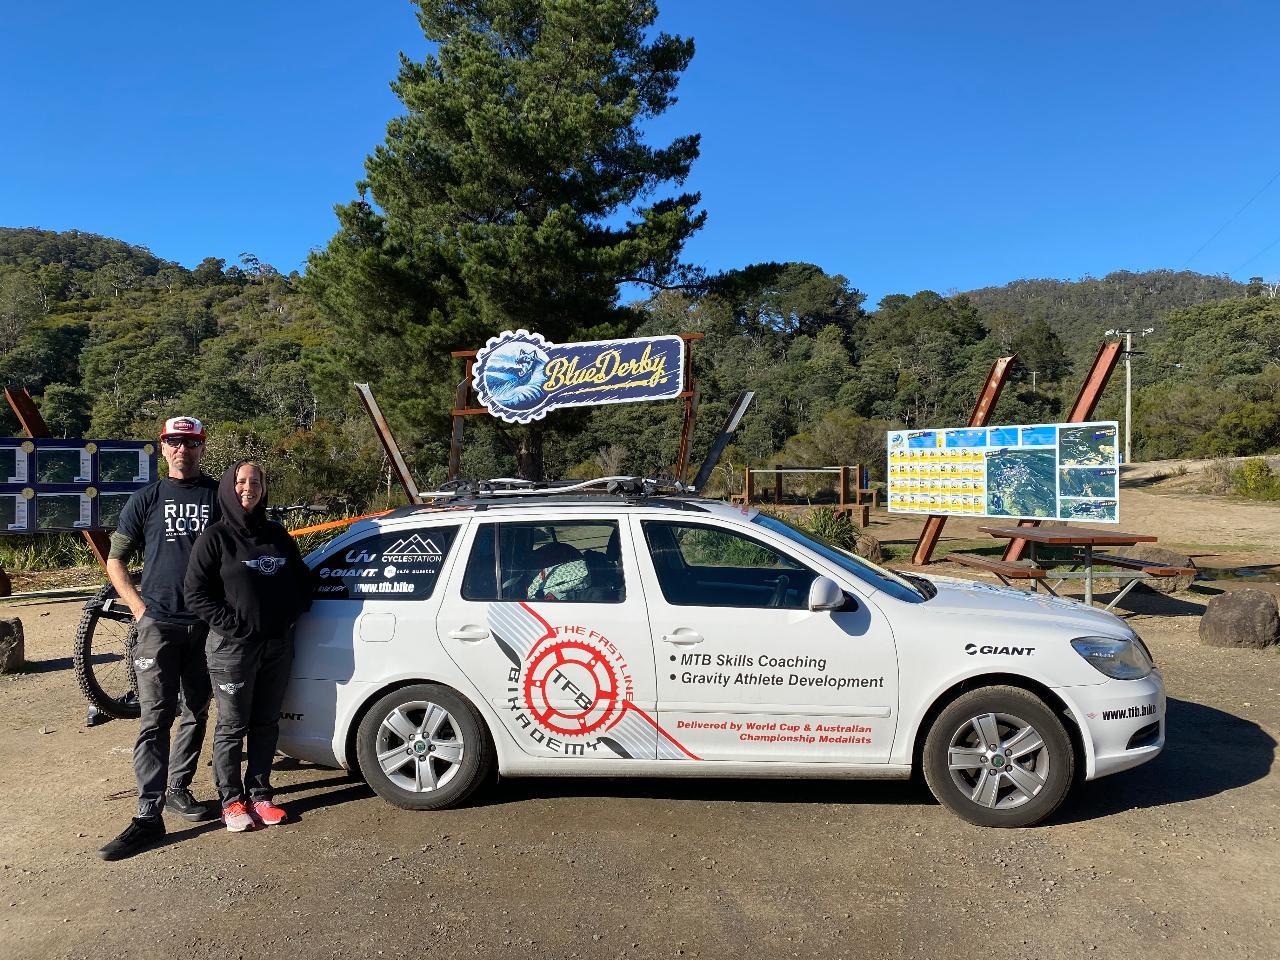 Tasmanian MTB program, 3 x full day, including shuttles